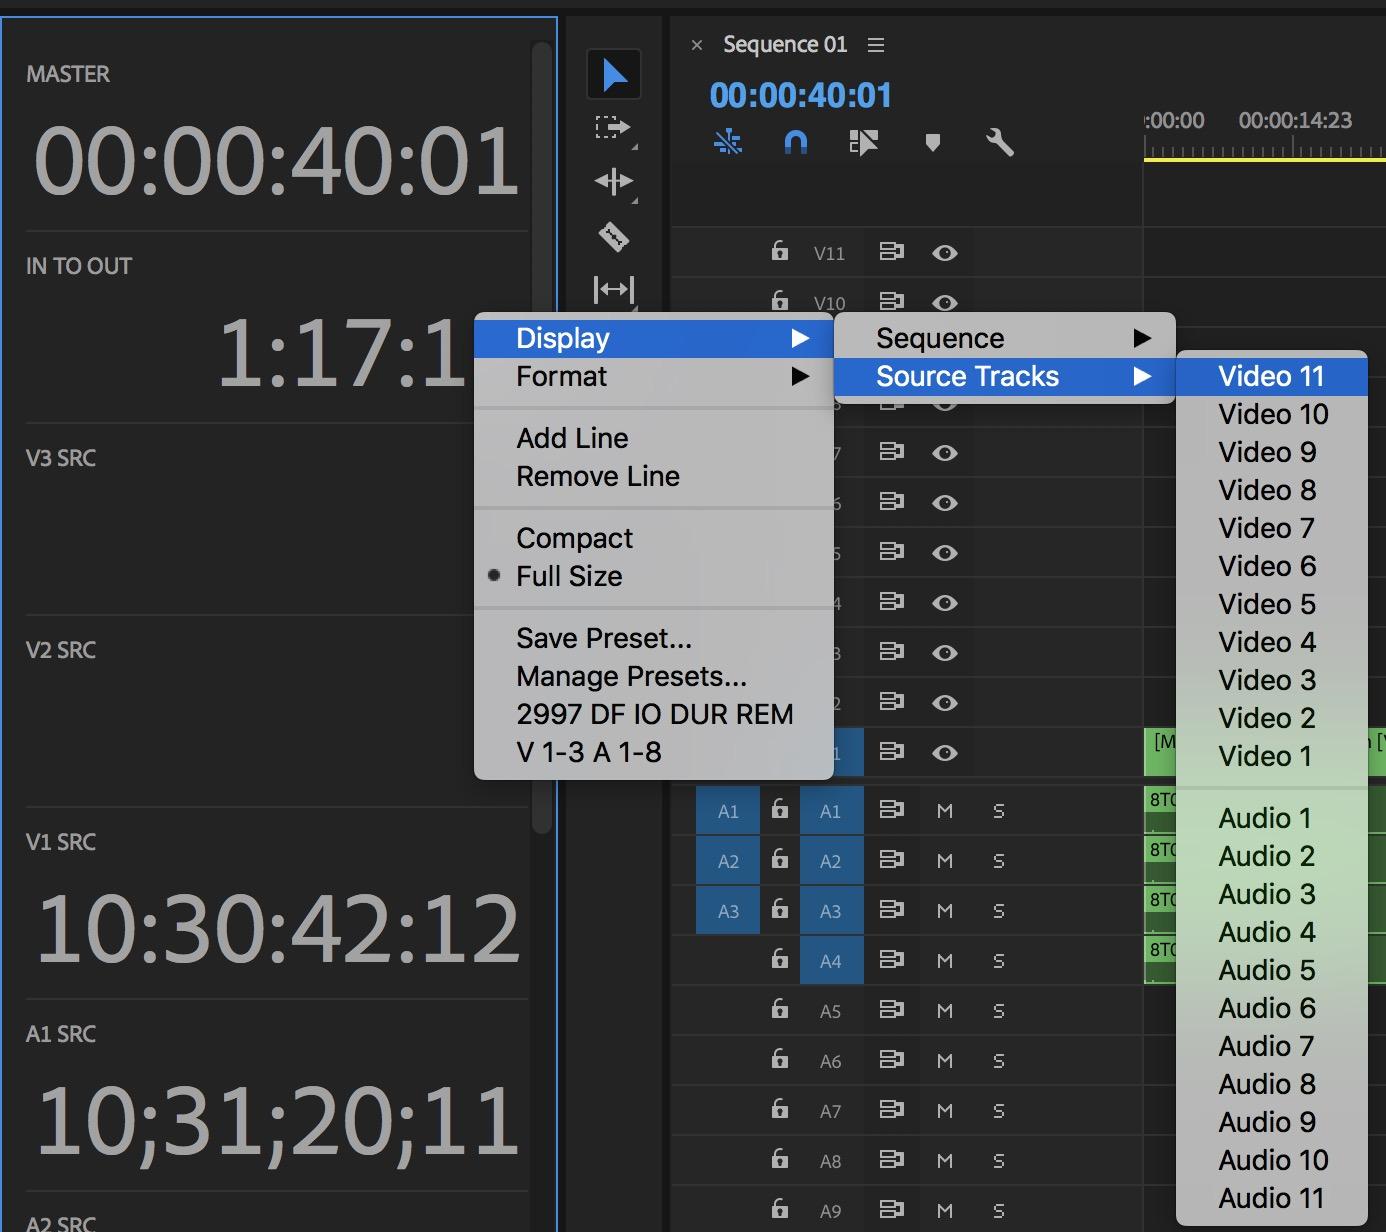 Adobe Premiere Pro timecode tracks